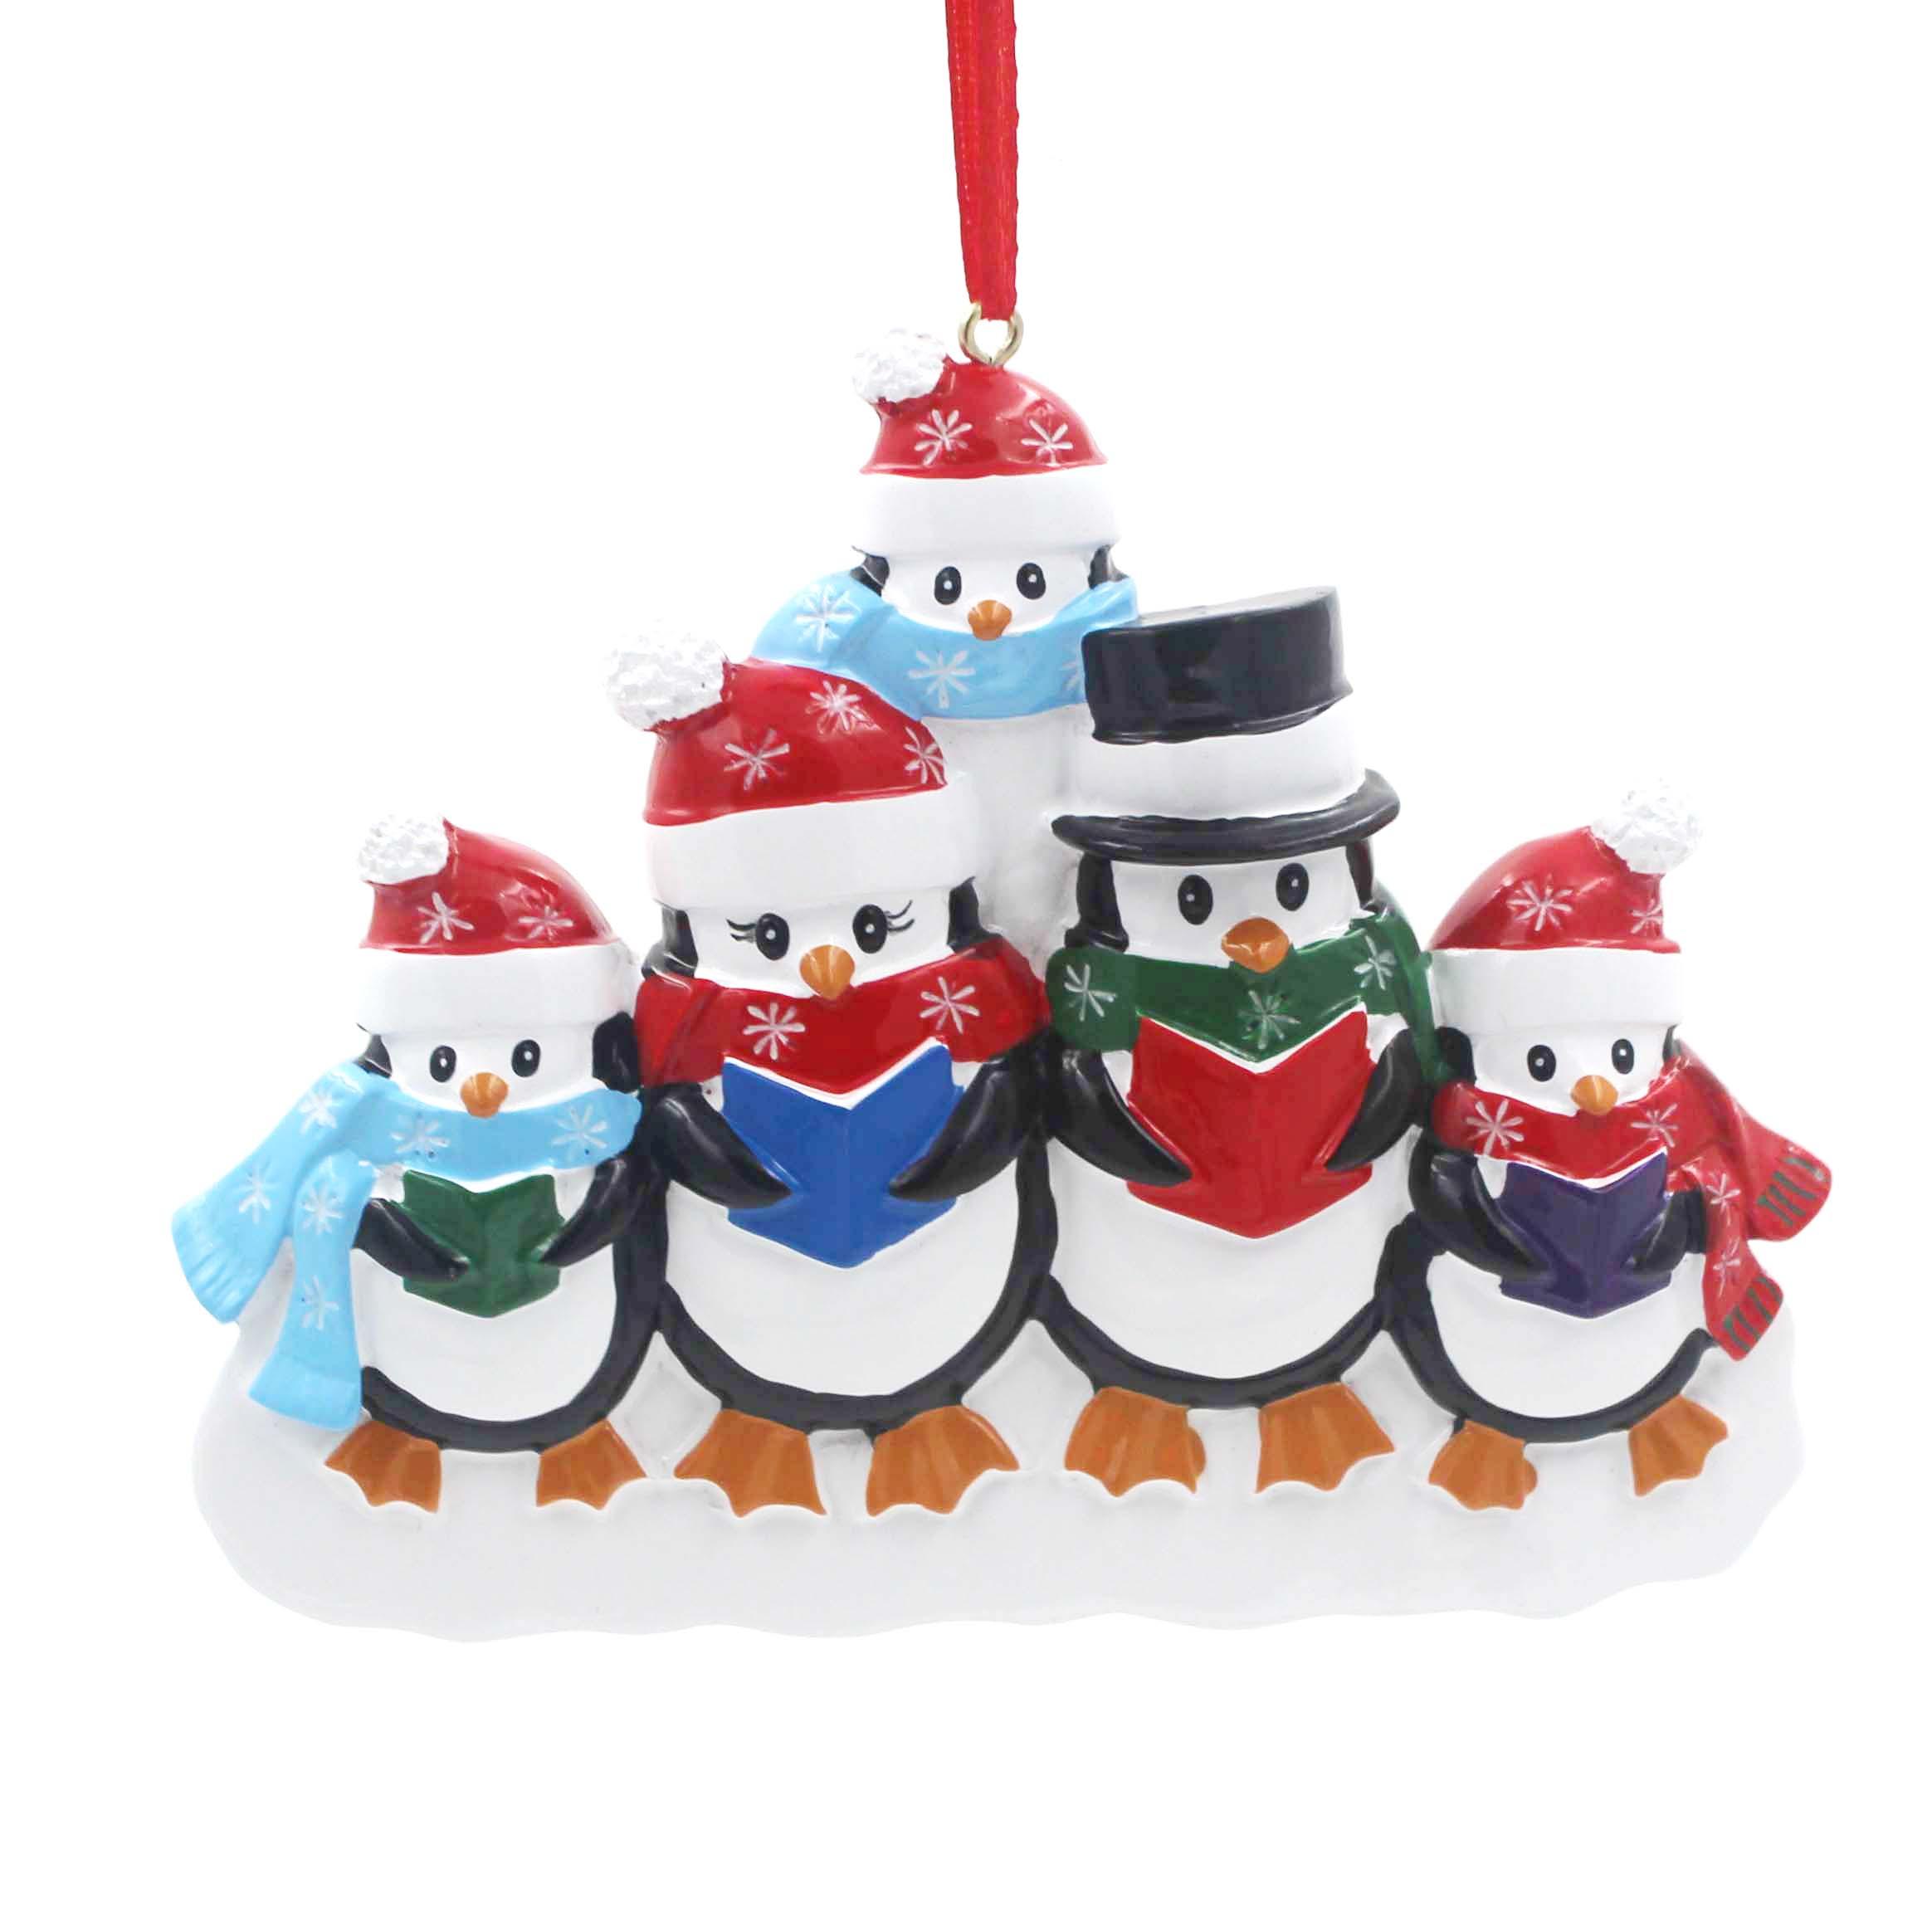 Customized Christmas Ornaments Wholesale